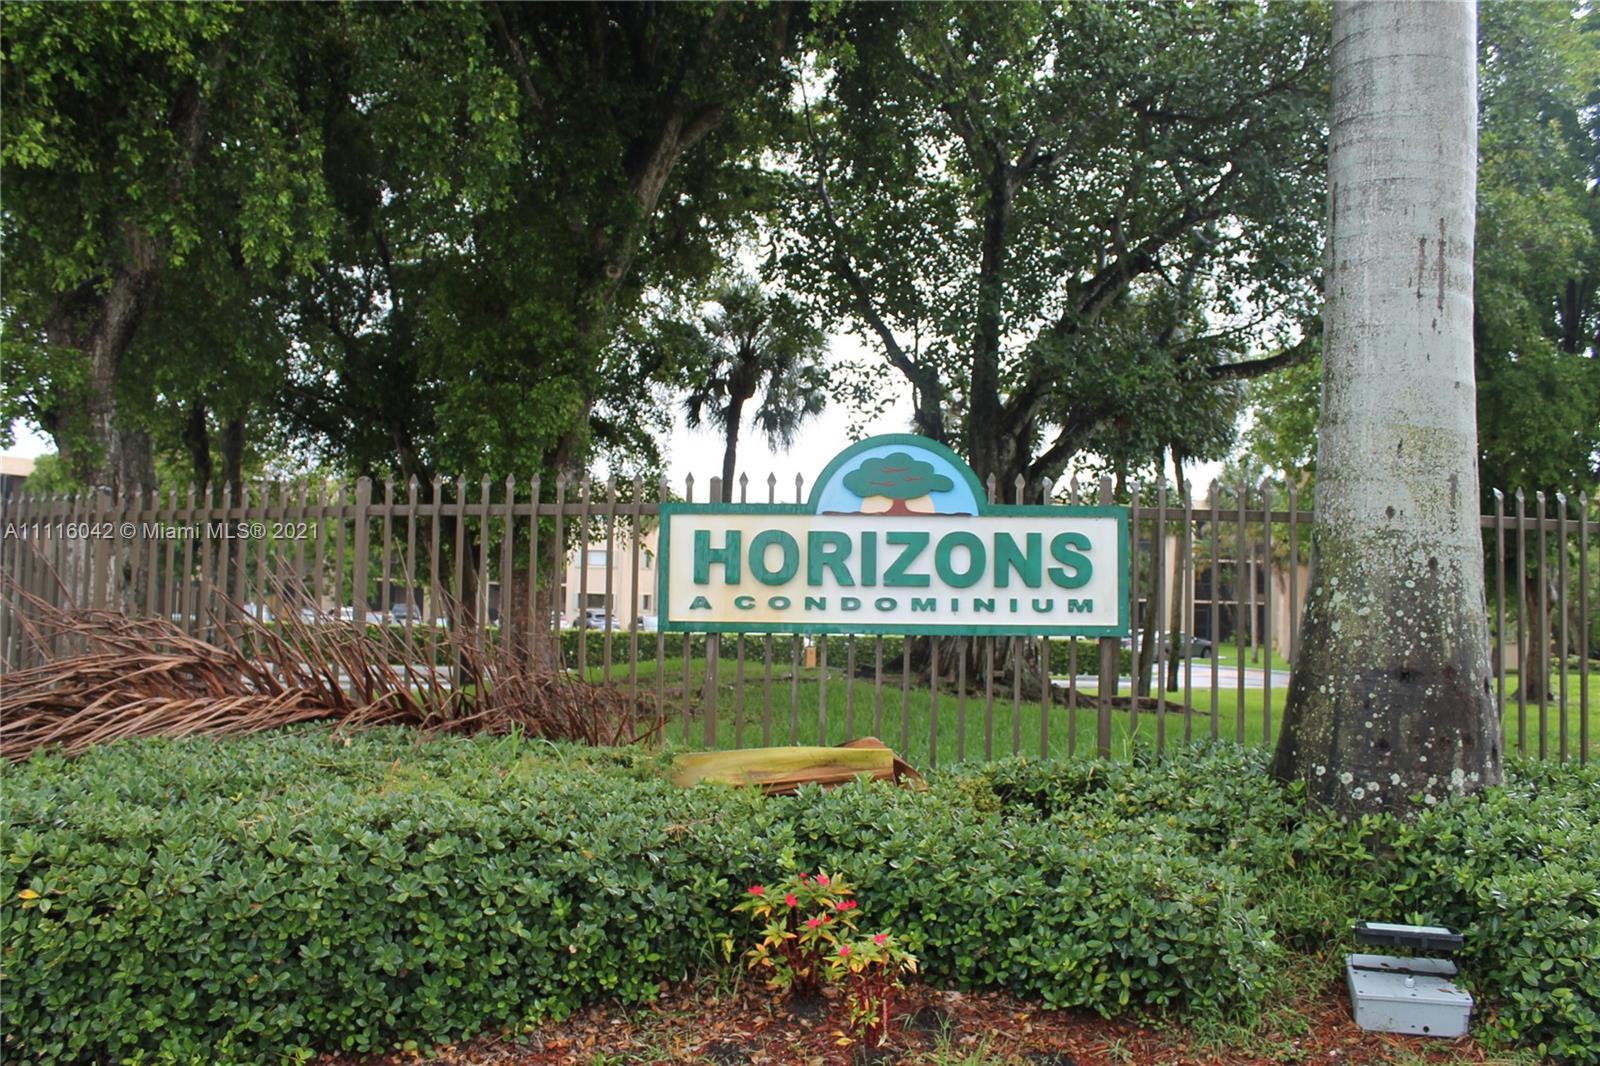 THE HORIZONS CONDO #2 Condo,For Rent,THE HORIZONS CONDO #2 Brickell,realty,broker,condos near me